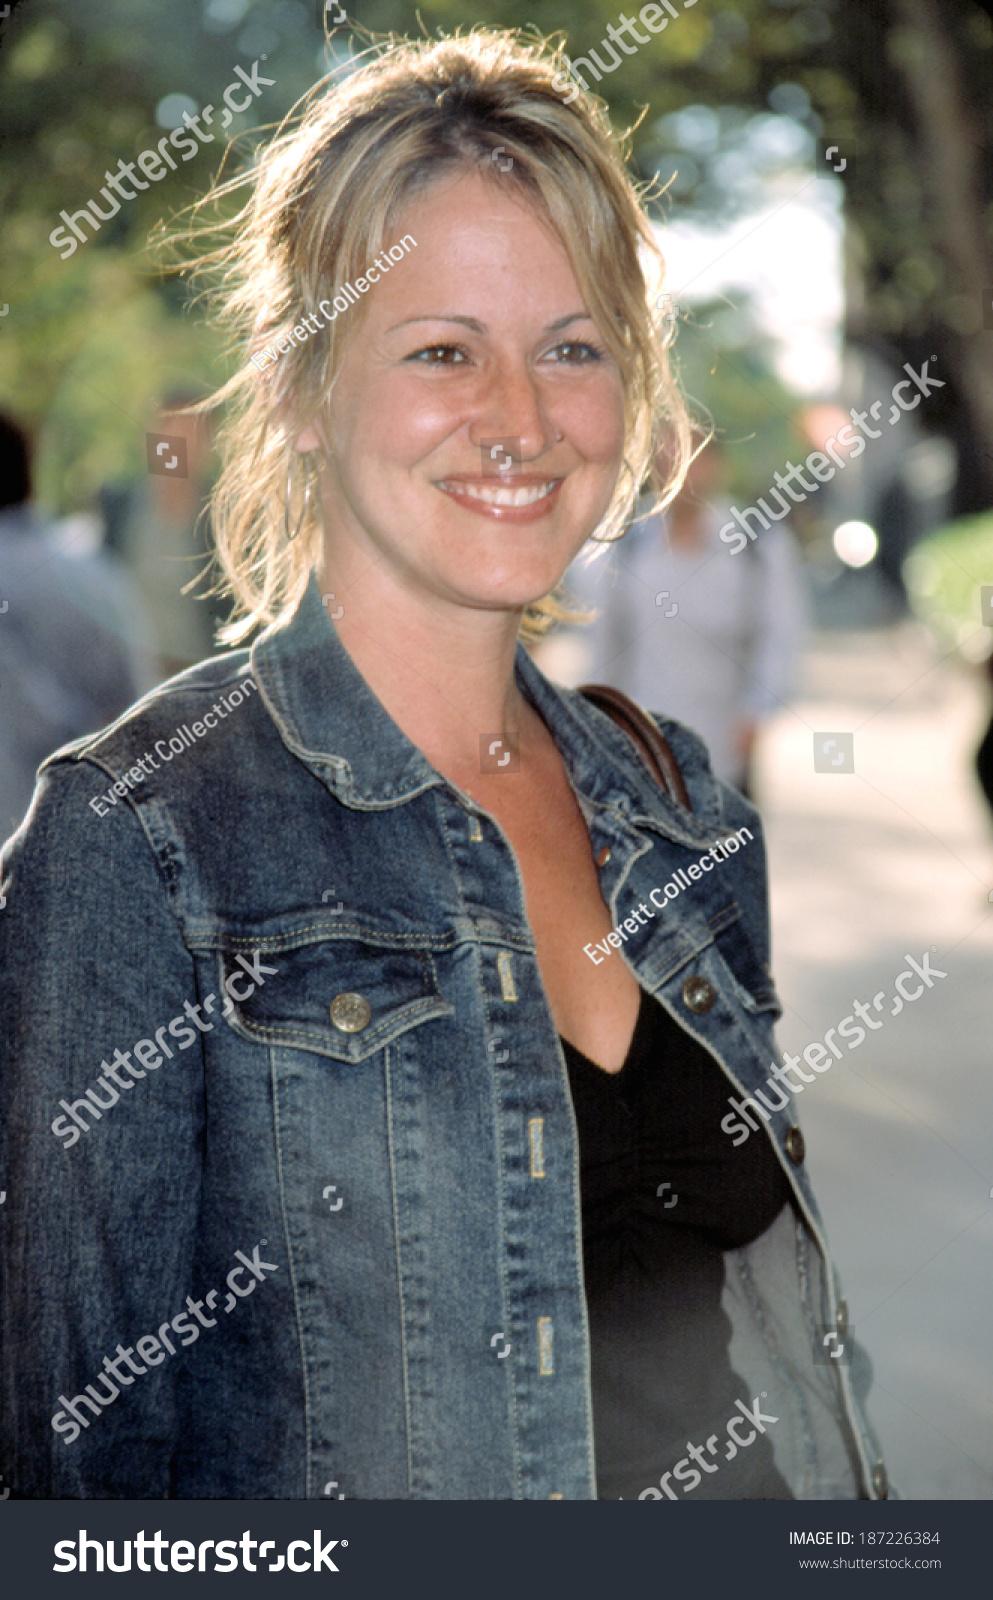 Adriana Mather Porno nude Lesley Osmond,Lindsay Frimodt USA 2 2002-2003